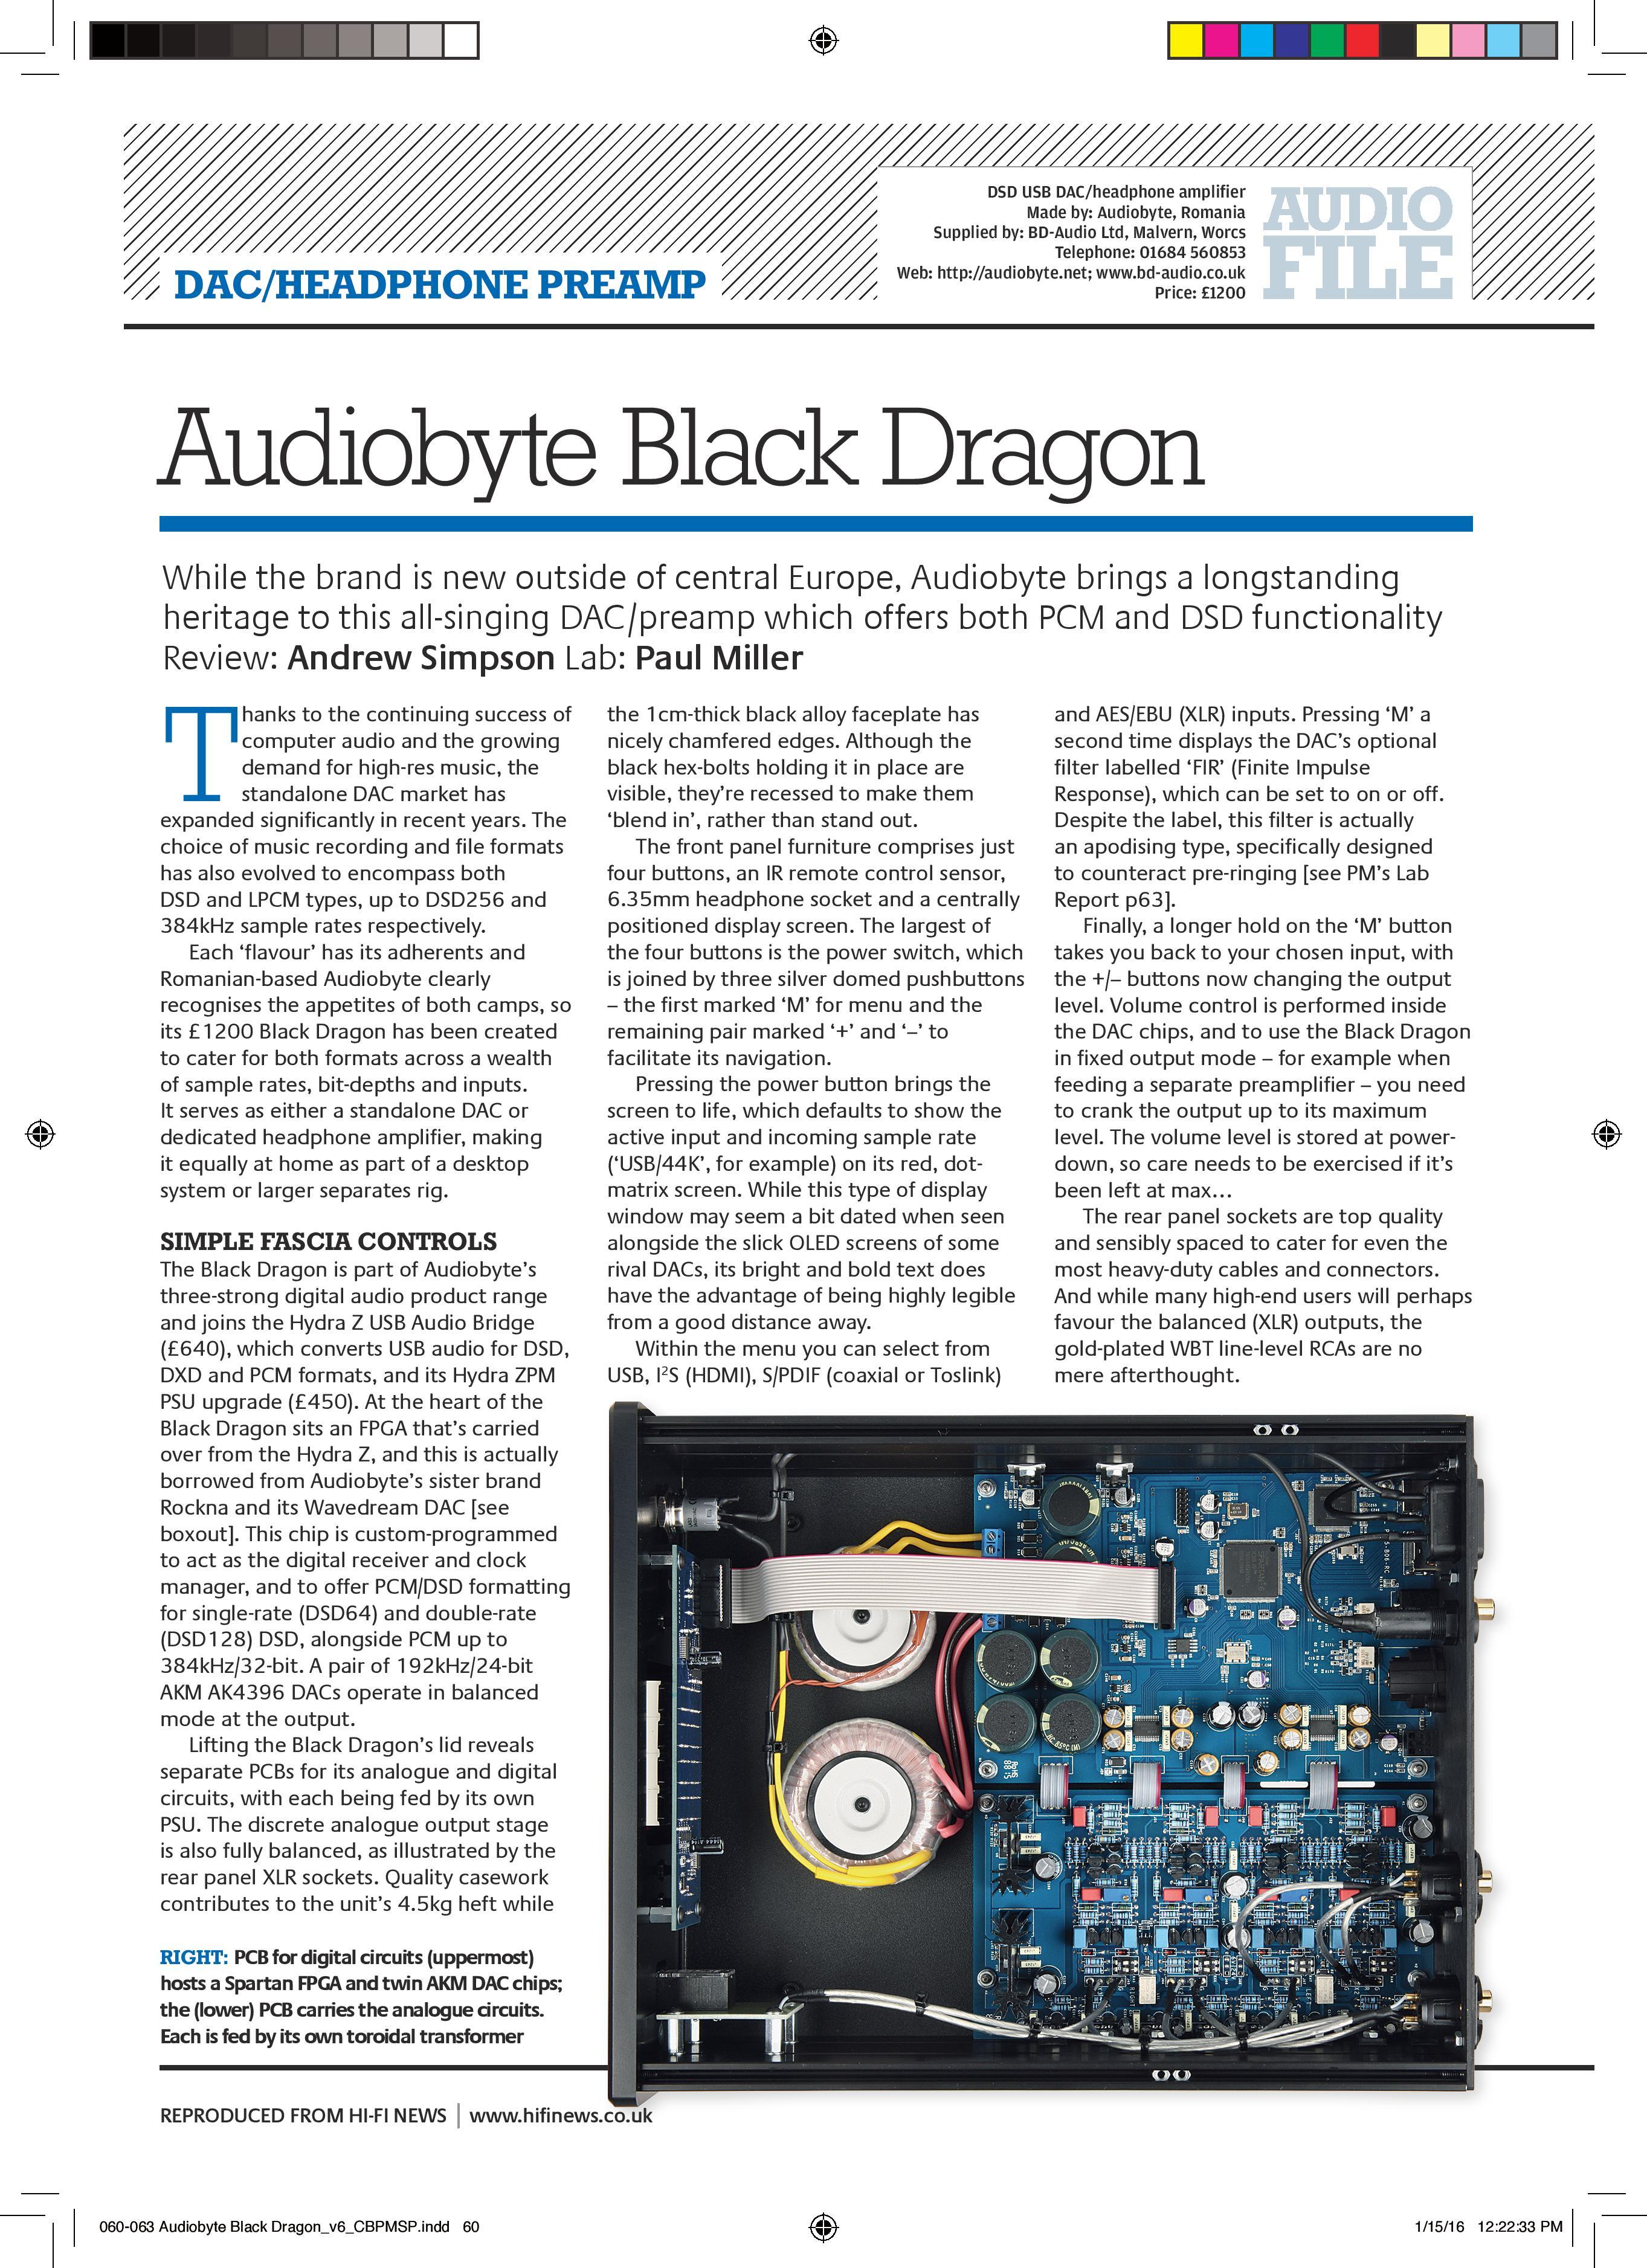 Audiobyte Black Dragon Dac Hifi News Review